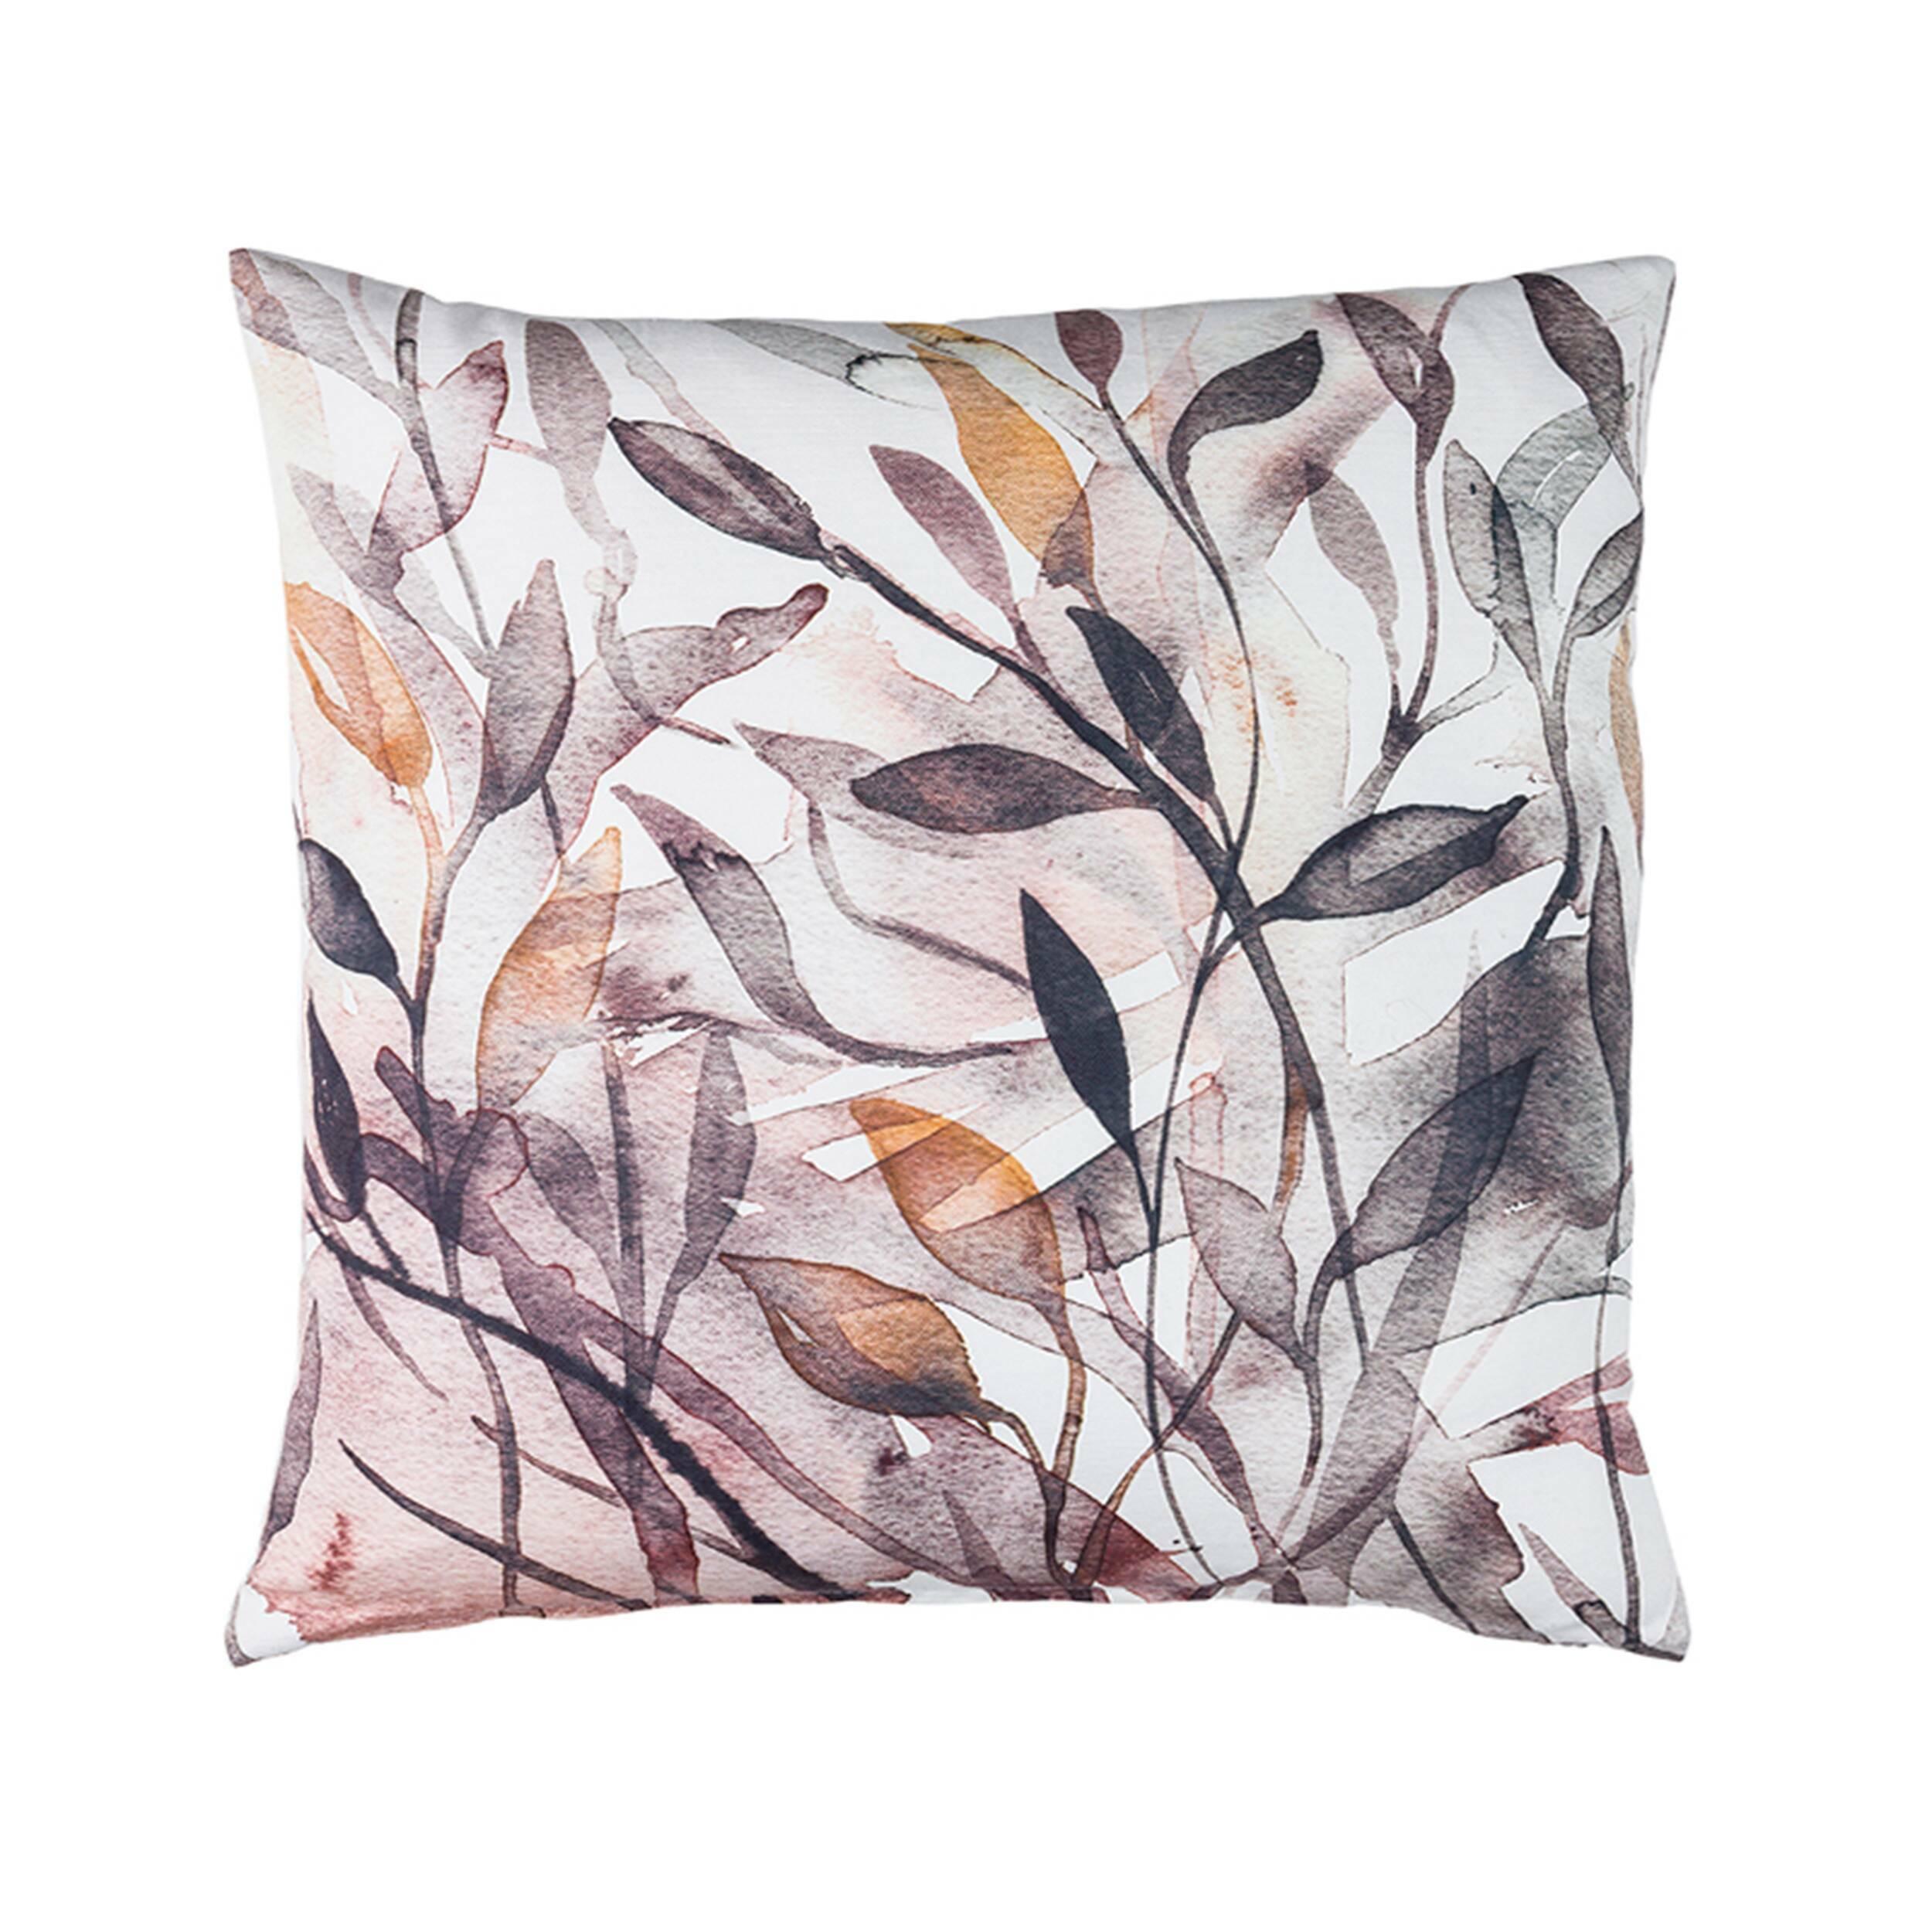 Купить Декоративная подушка AVERY (01025583493), Cosmo, Мульти, хлопок, перо